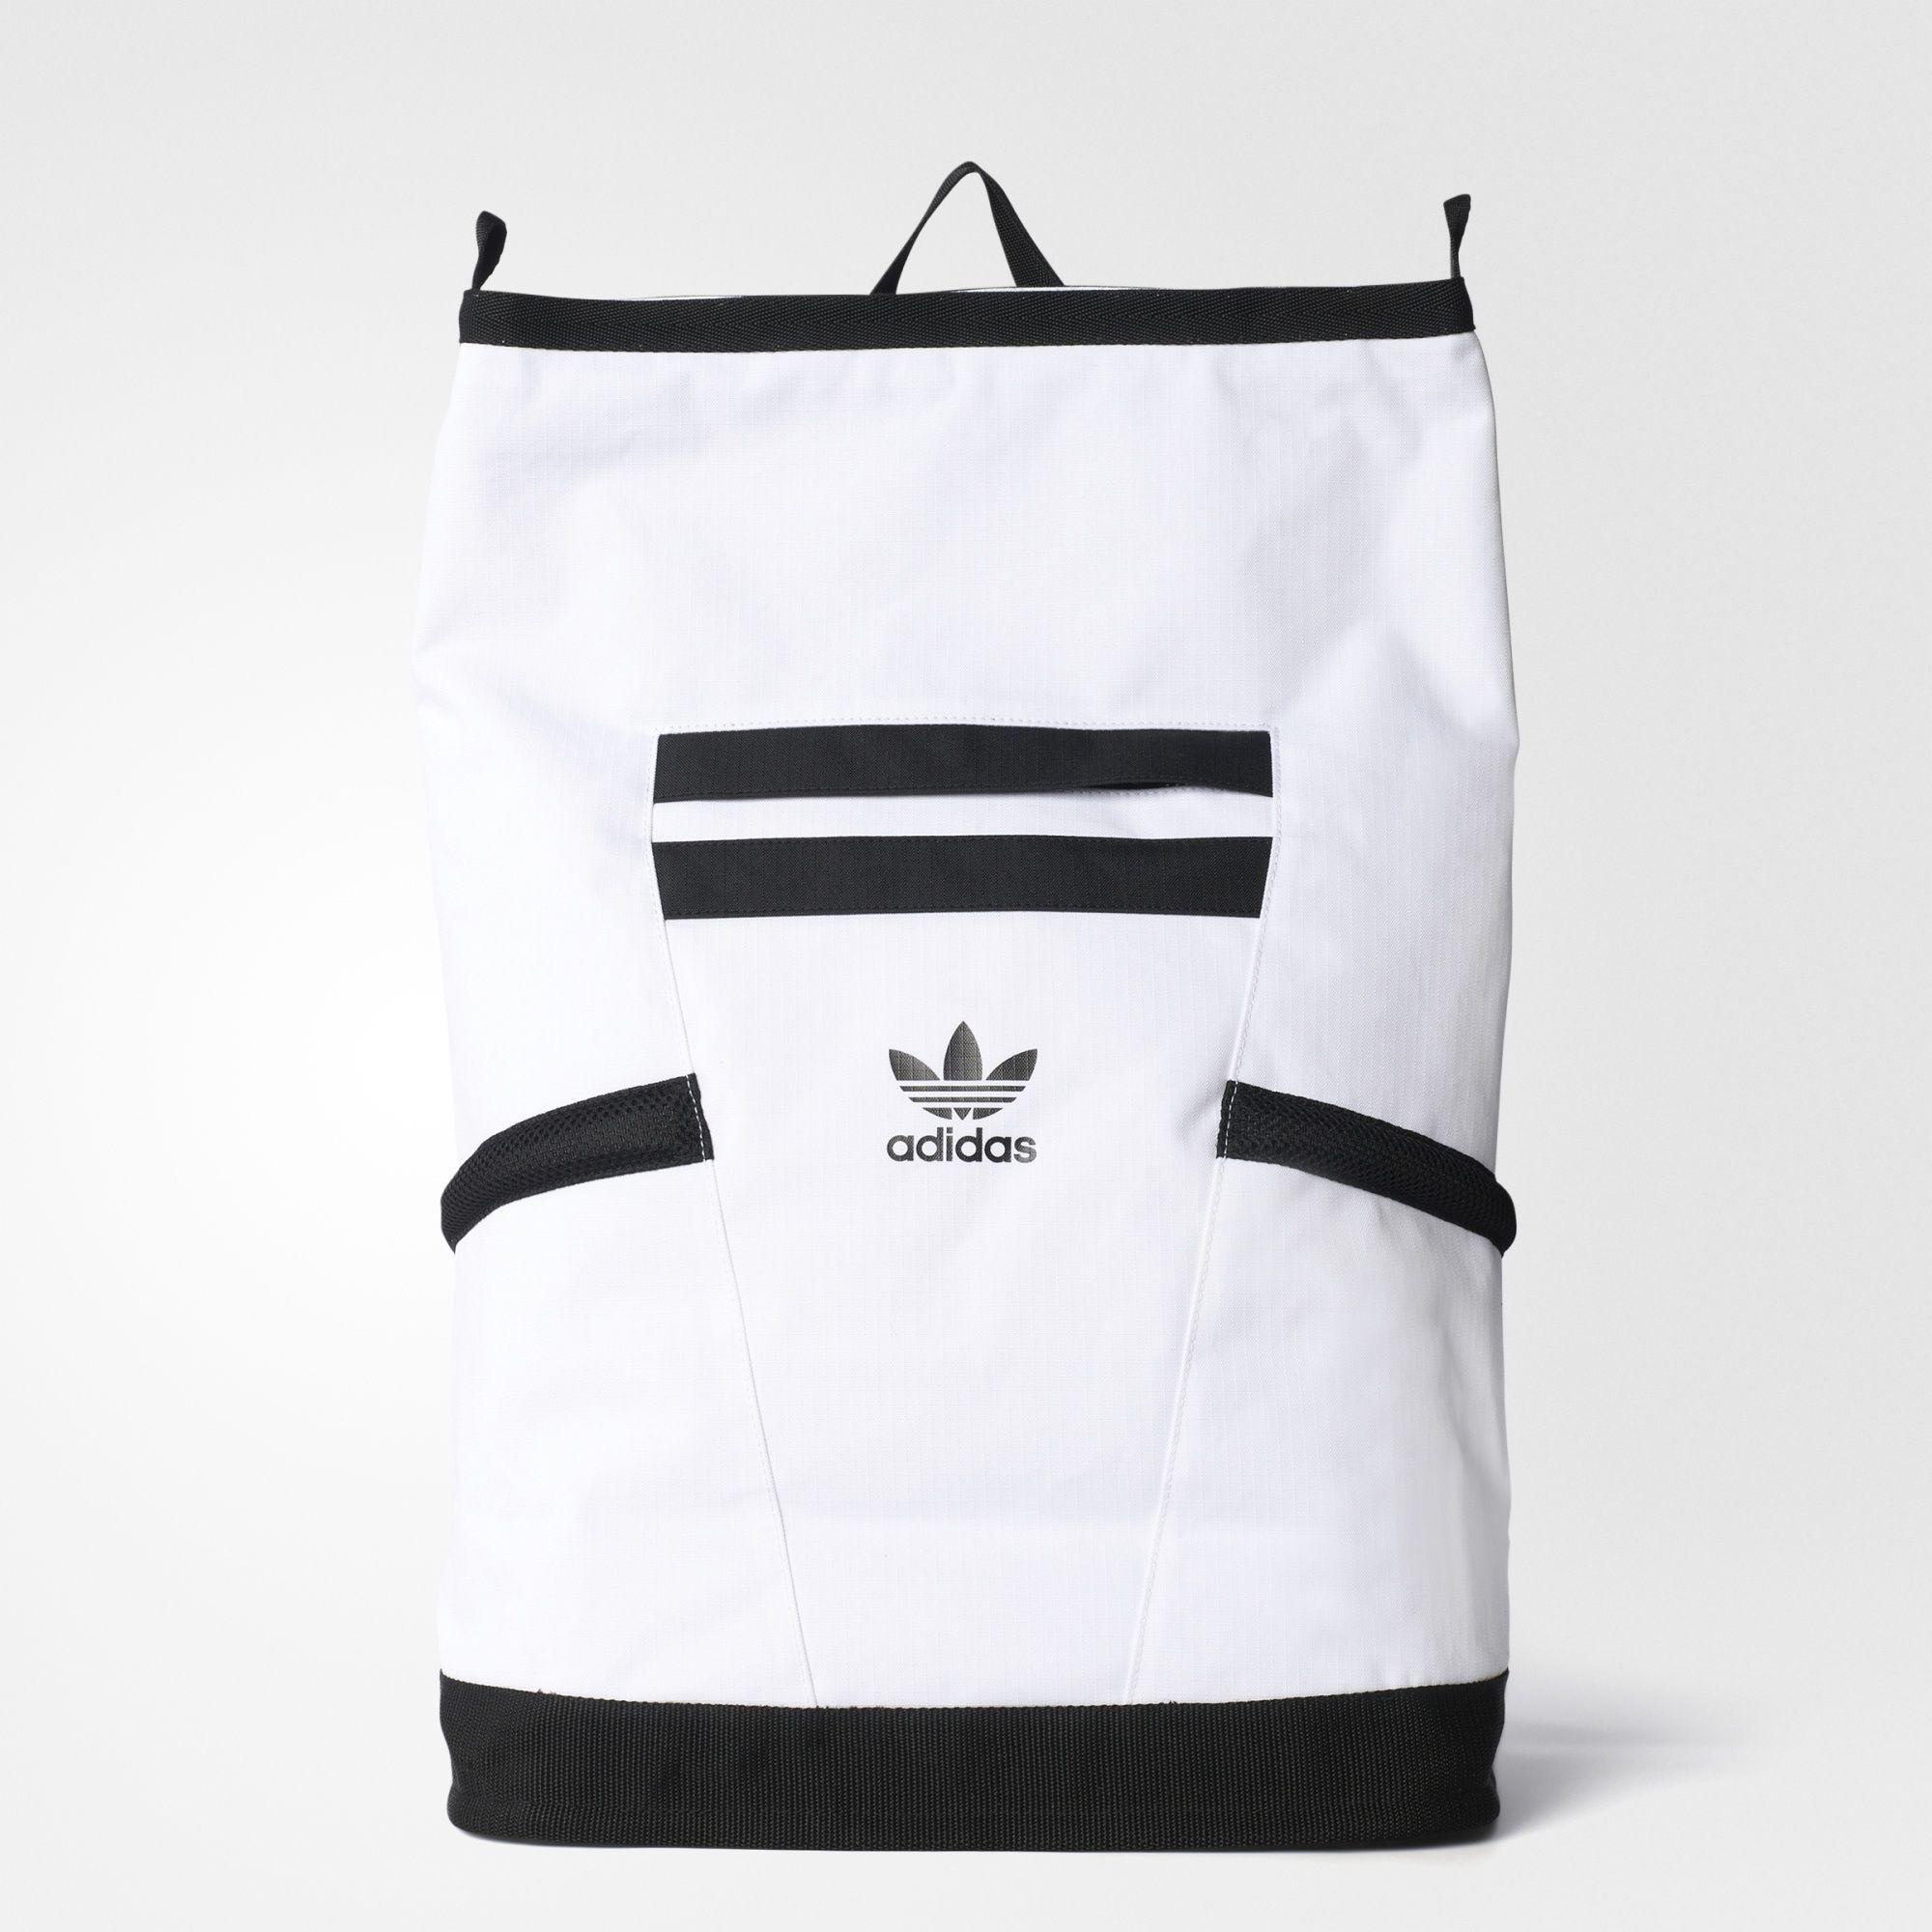 ab32eddba60 adidas - Trip White Future Backpack     adidas   Pinterest   Adidas ...